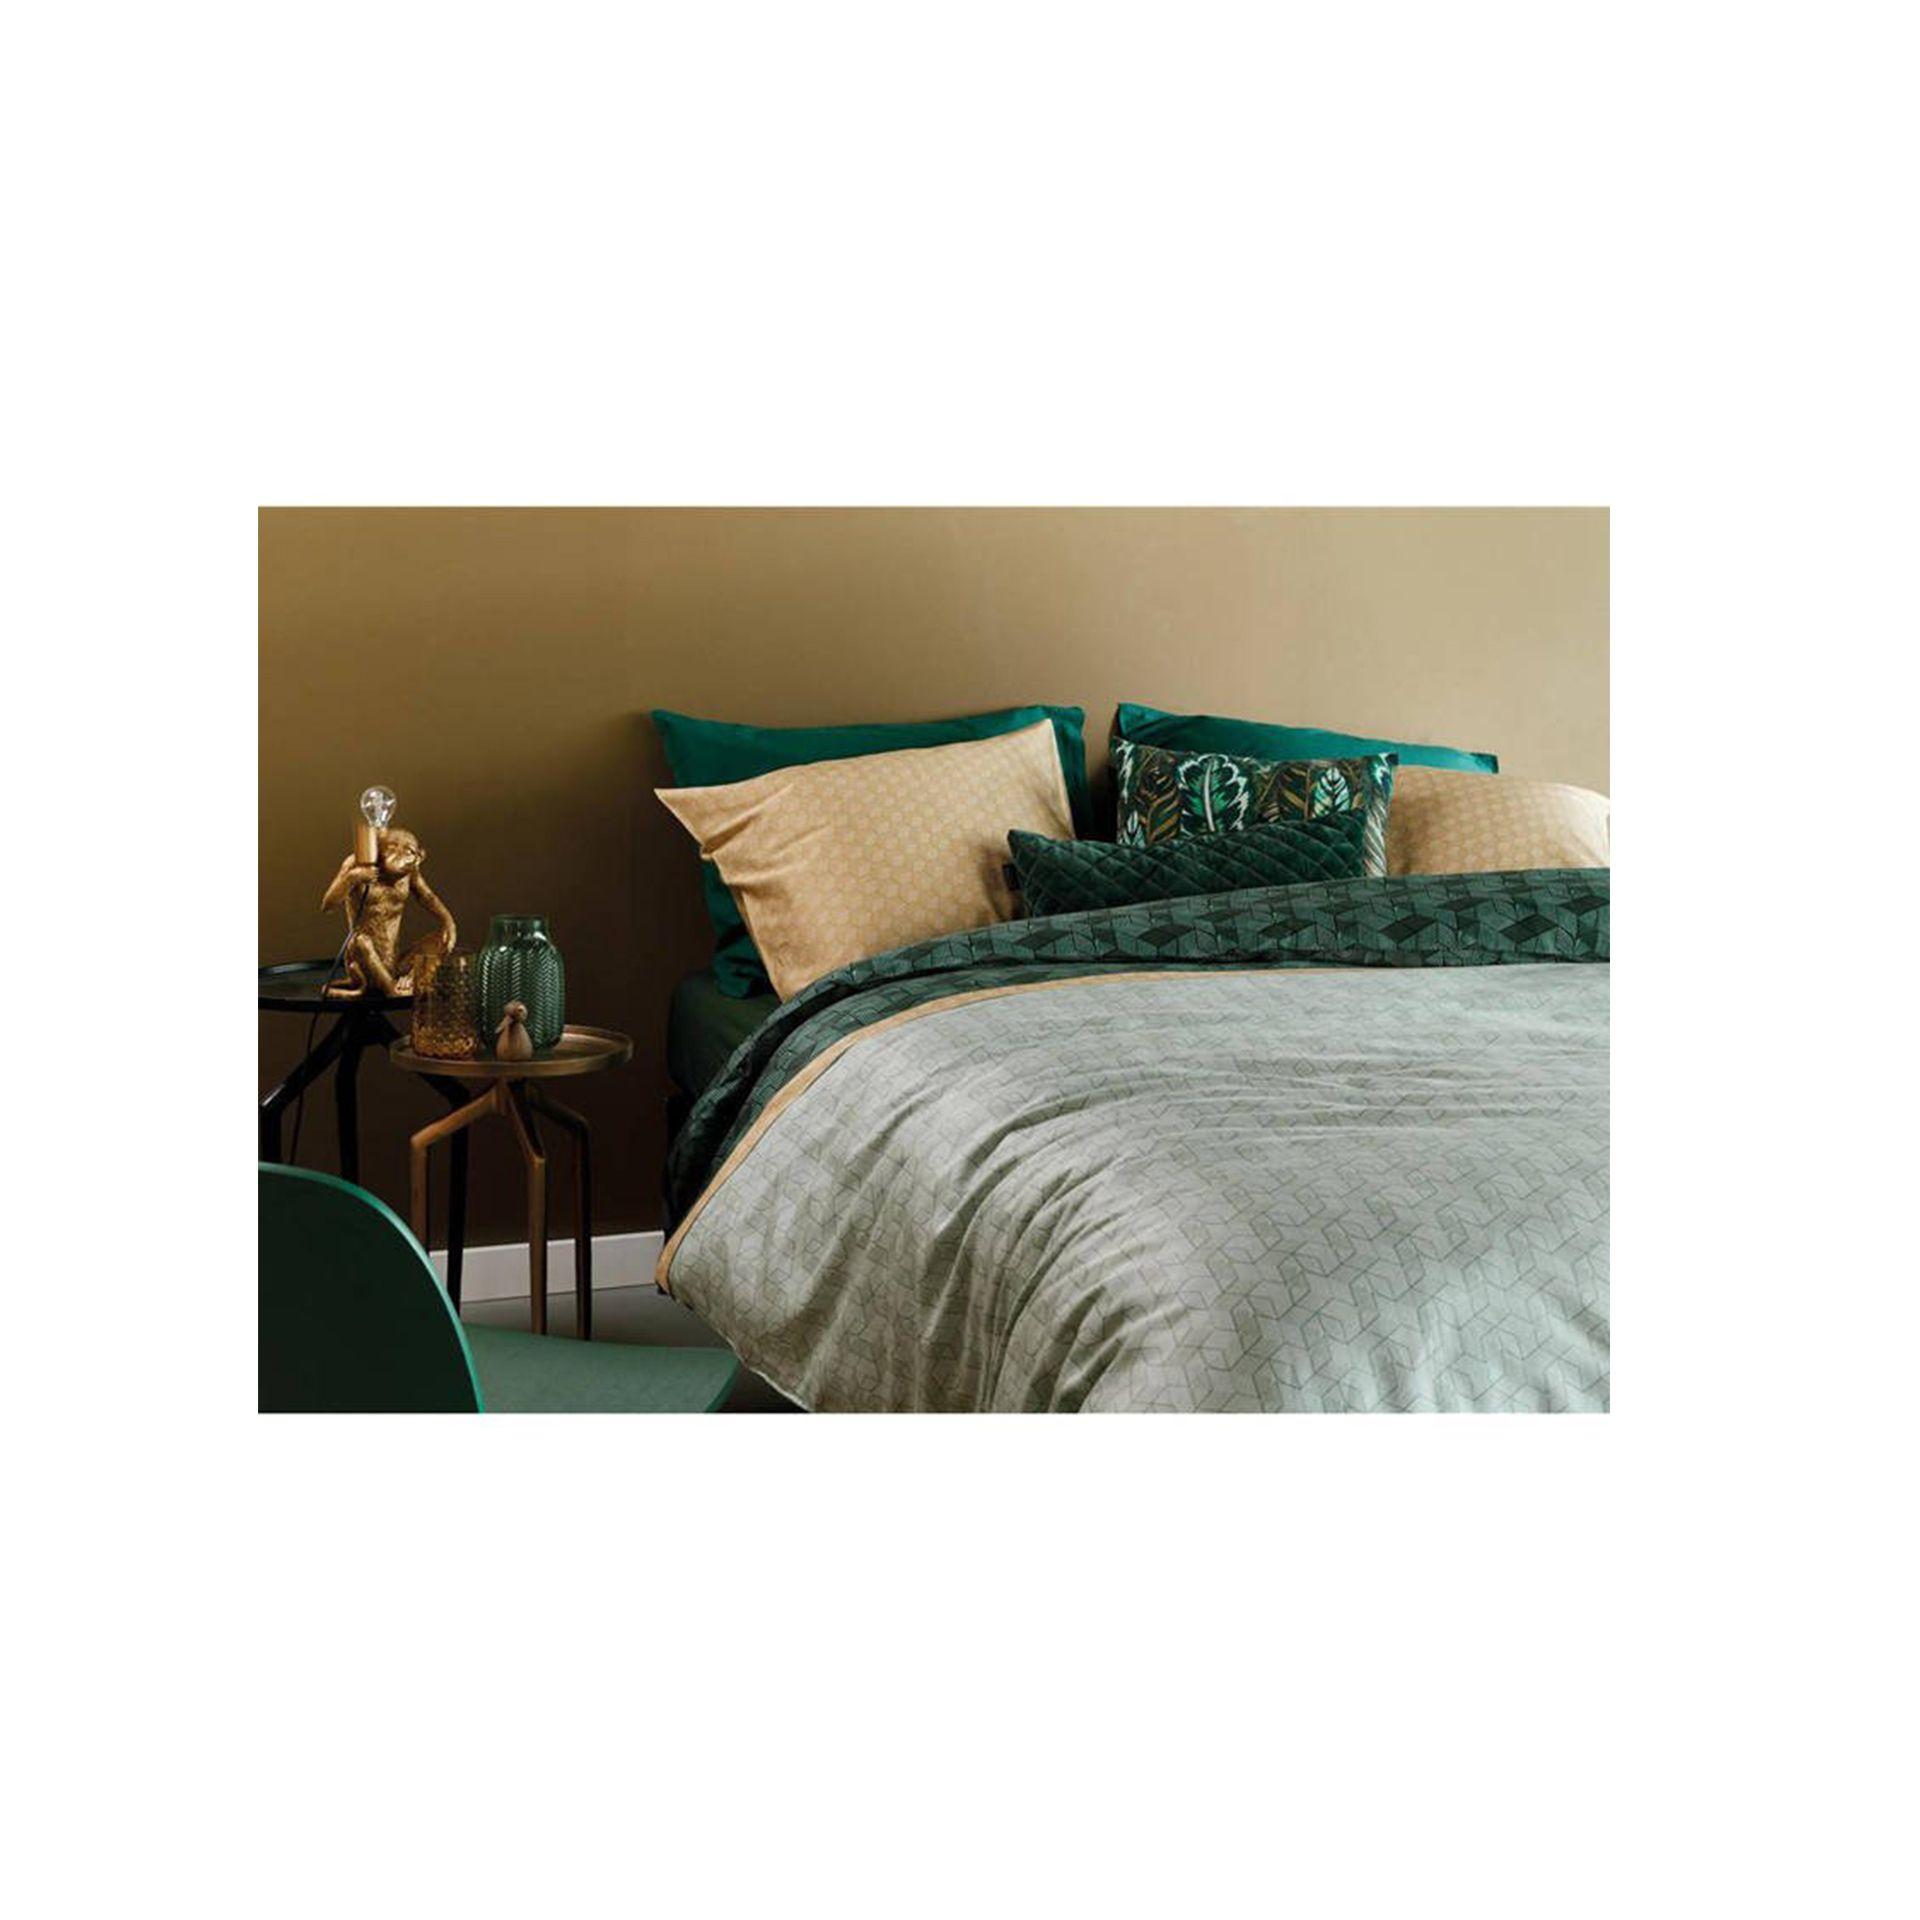 Beddinghouse - Grunnar green dekbedovertrek